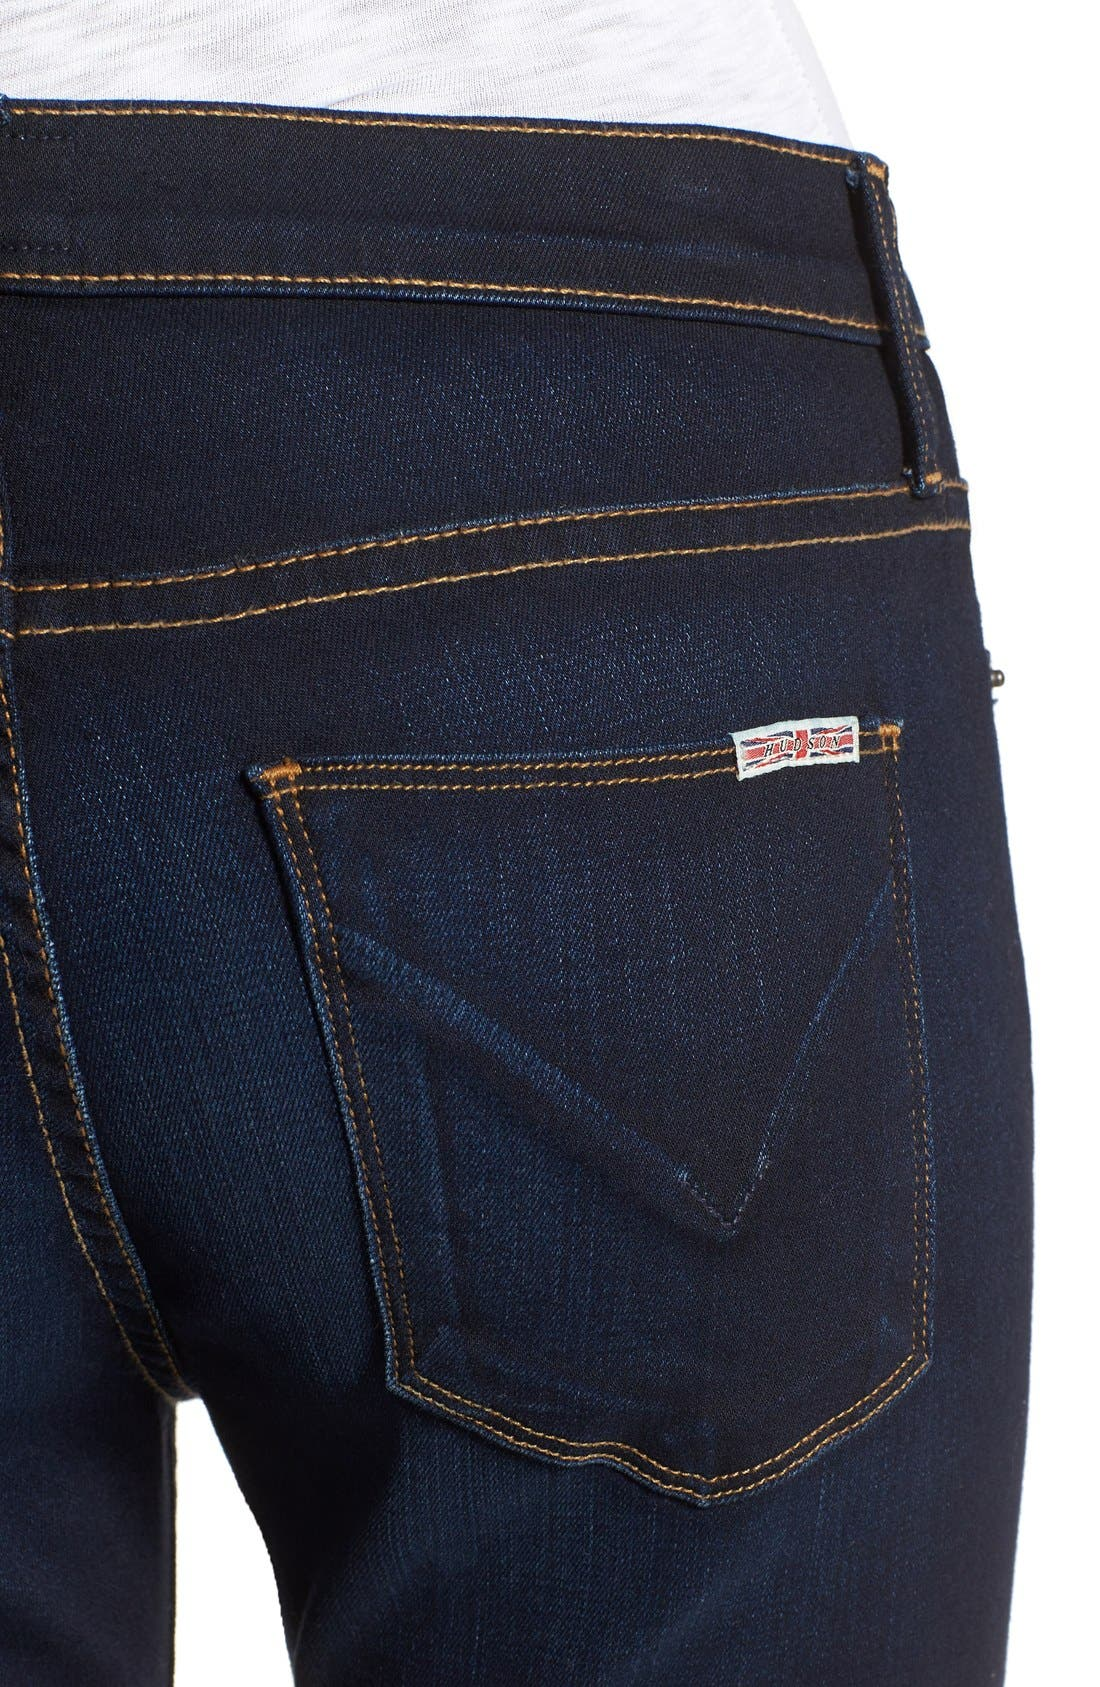 Alternate Image 4  - Hudson Jeans 'Love' Bootcut Jeans (Redux) (Petite)